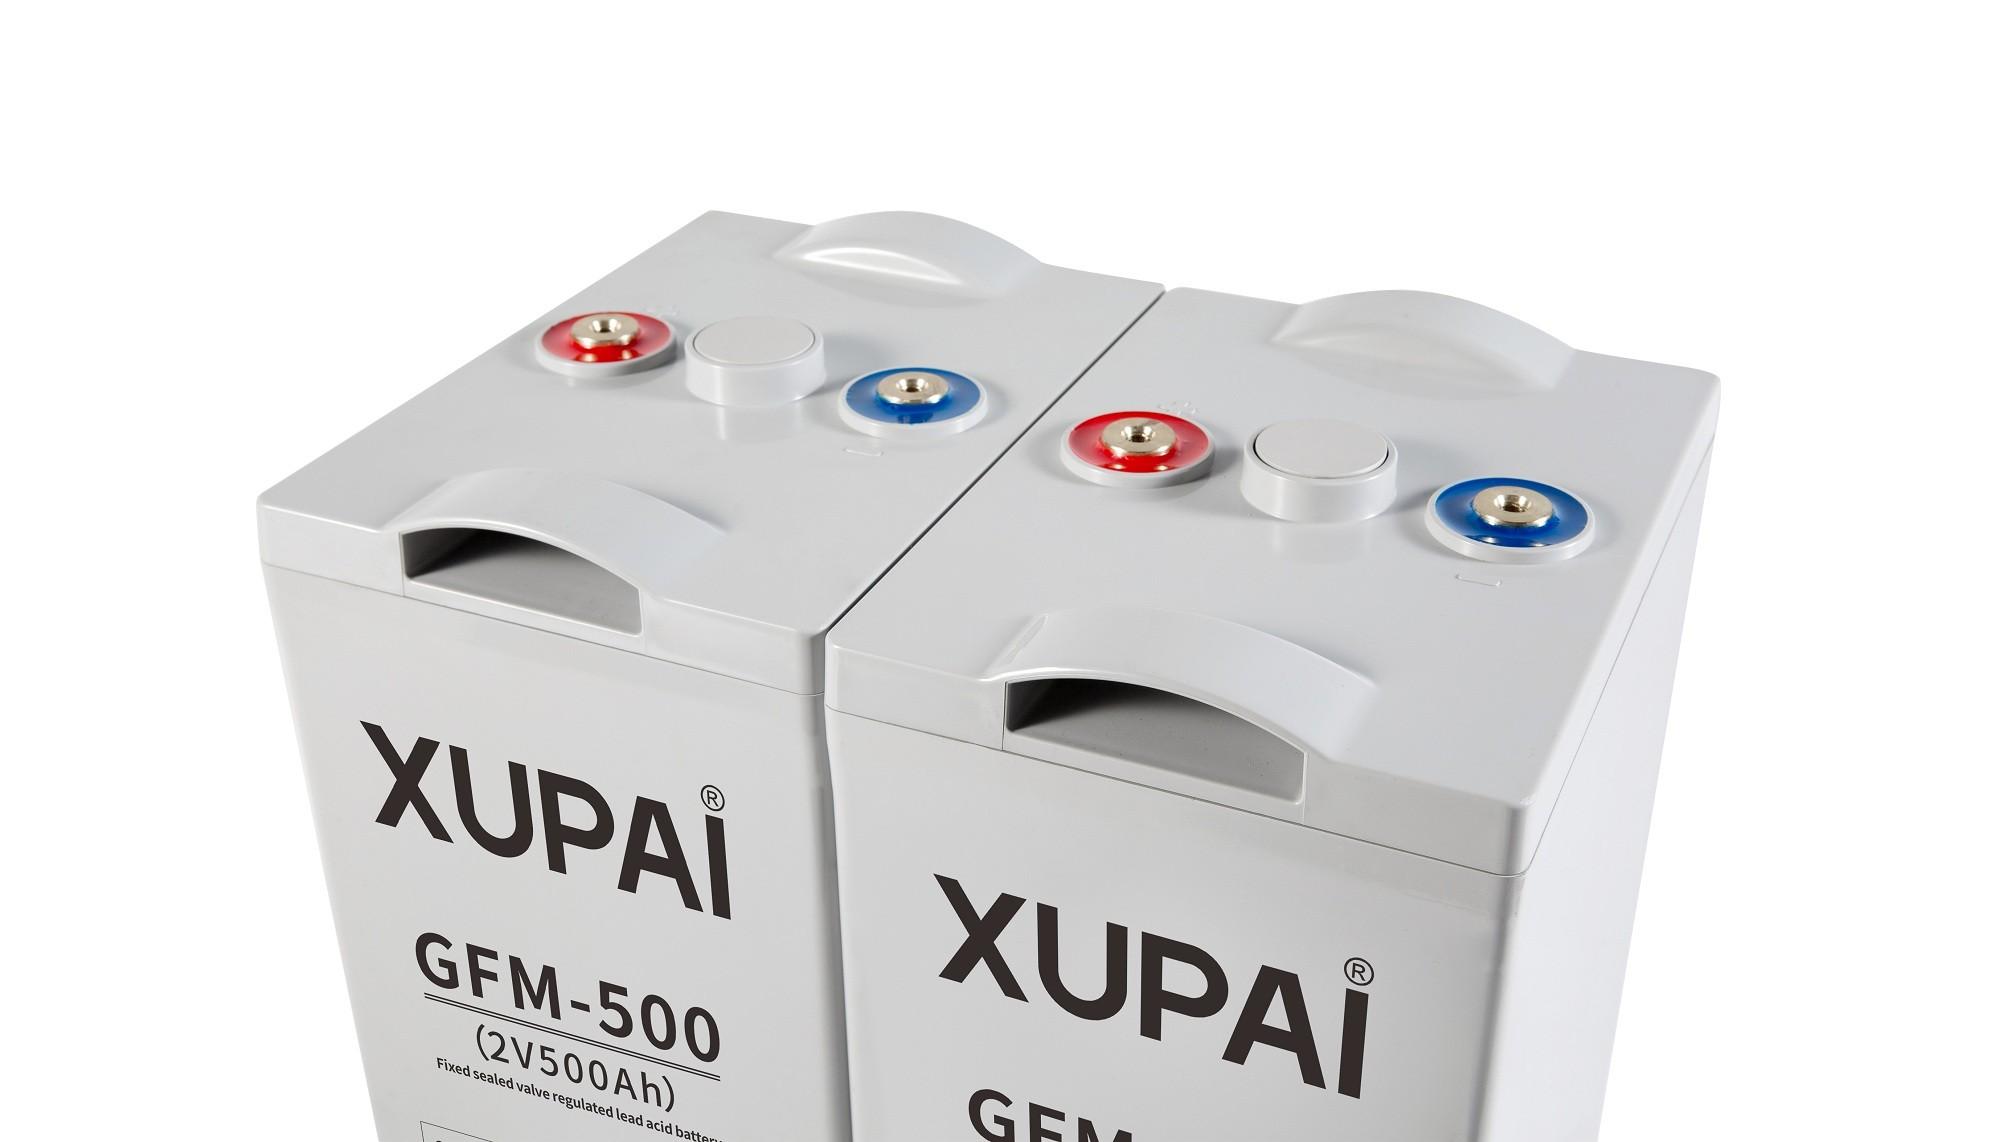 XUPAI GFM-500 long life backup  base station battery